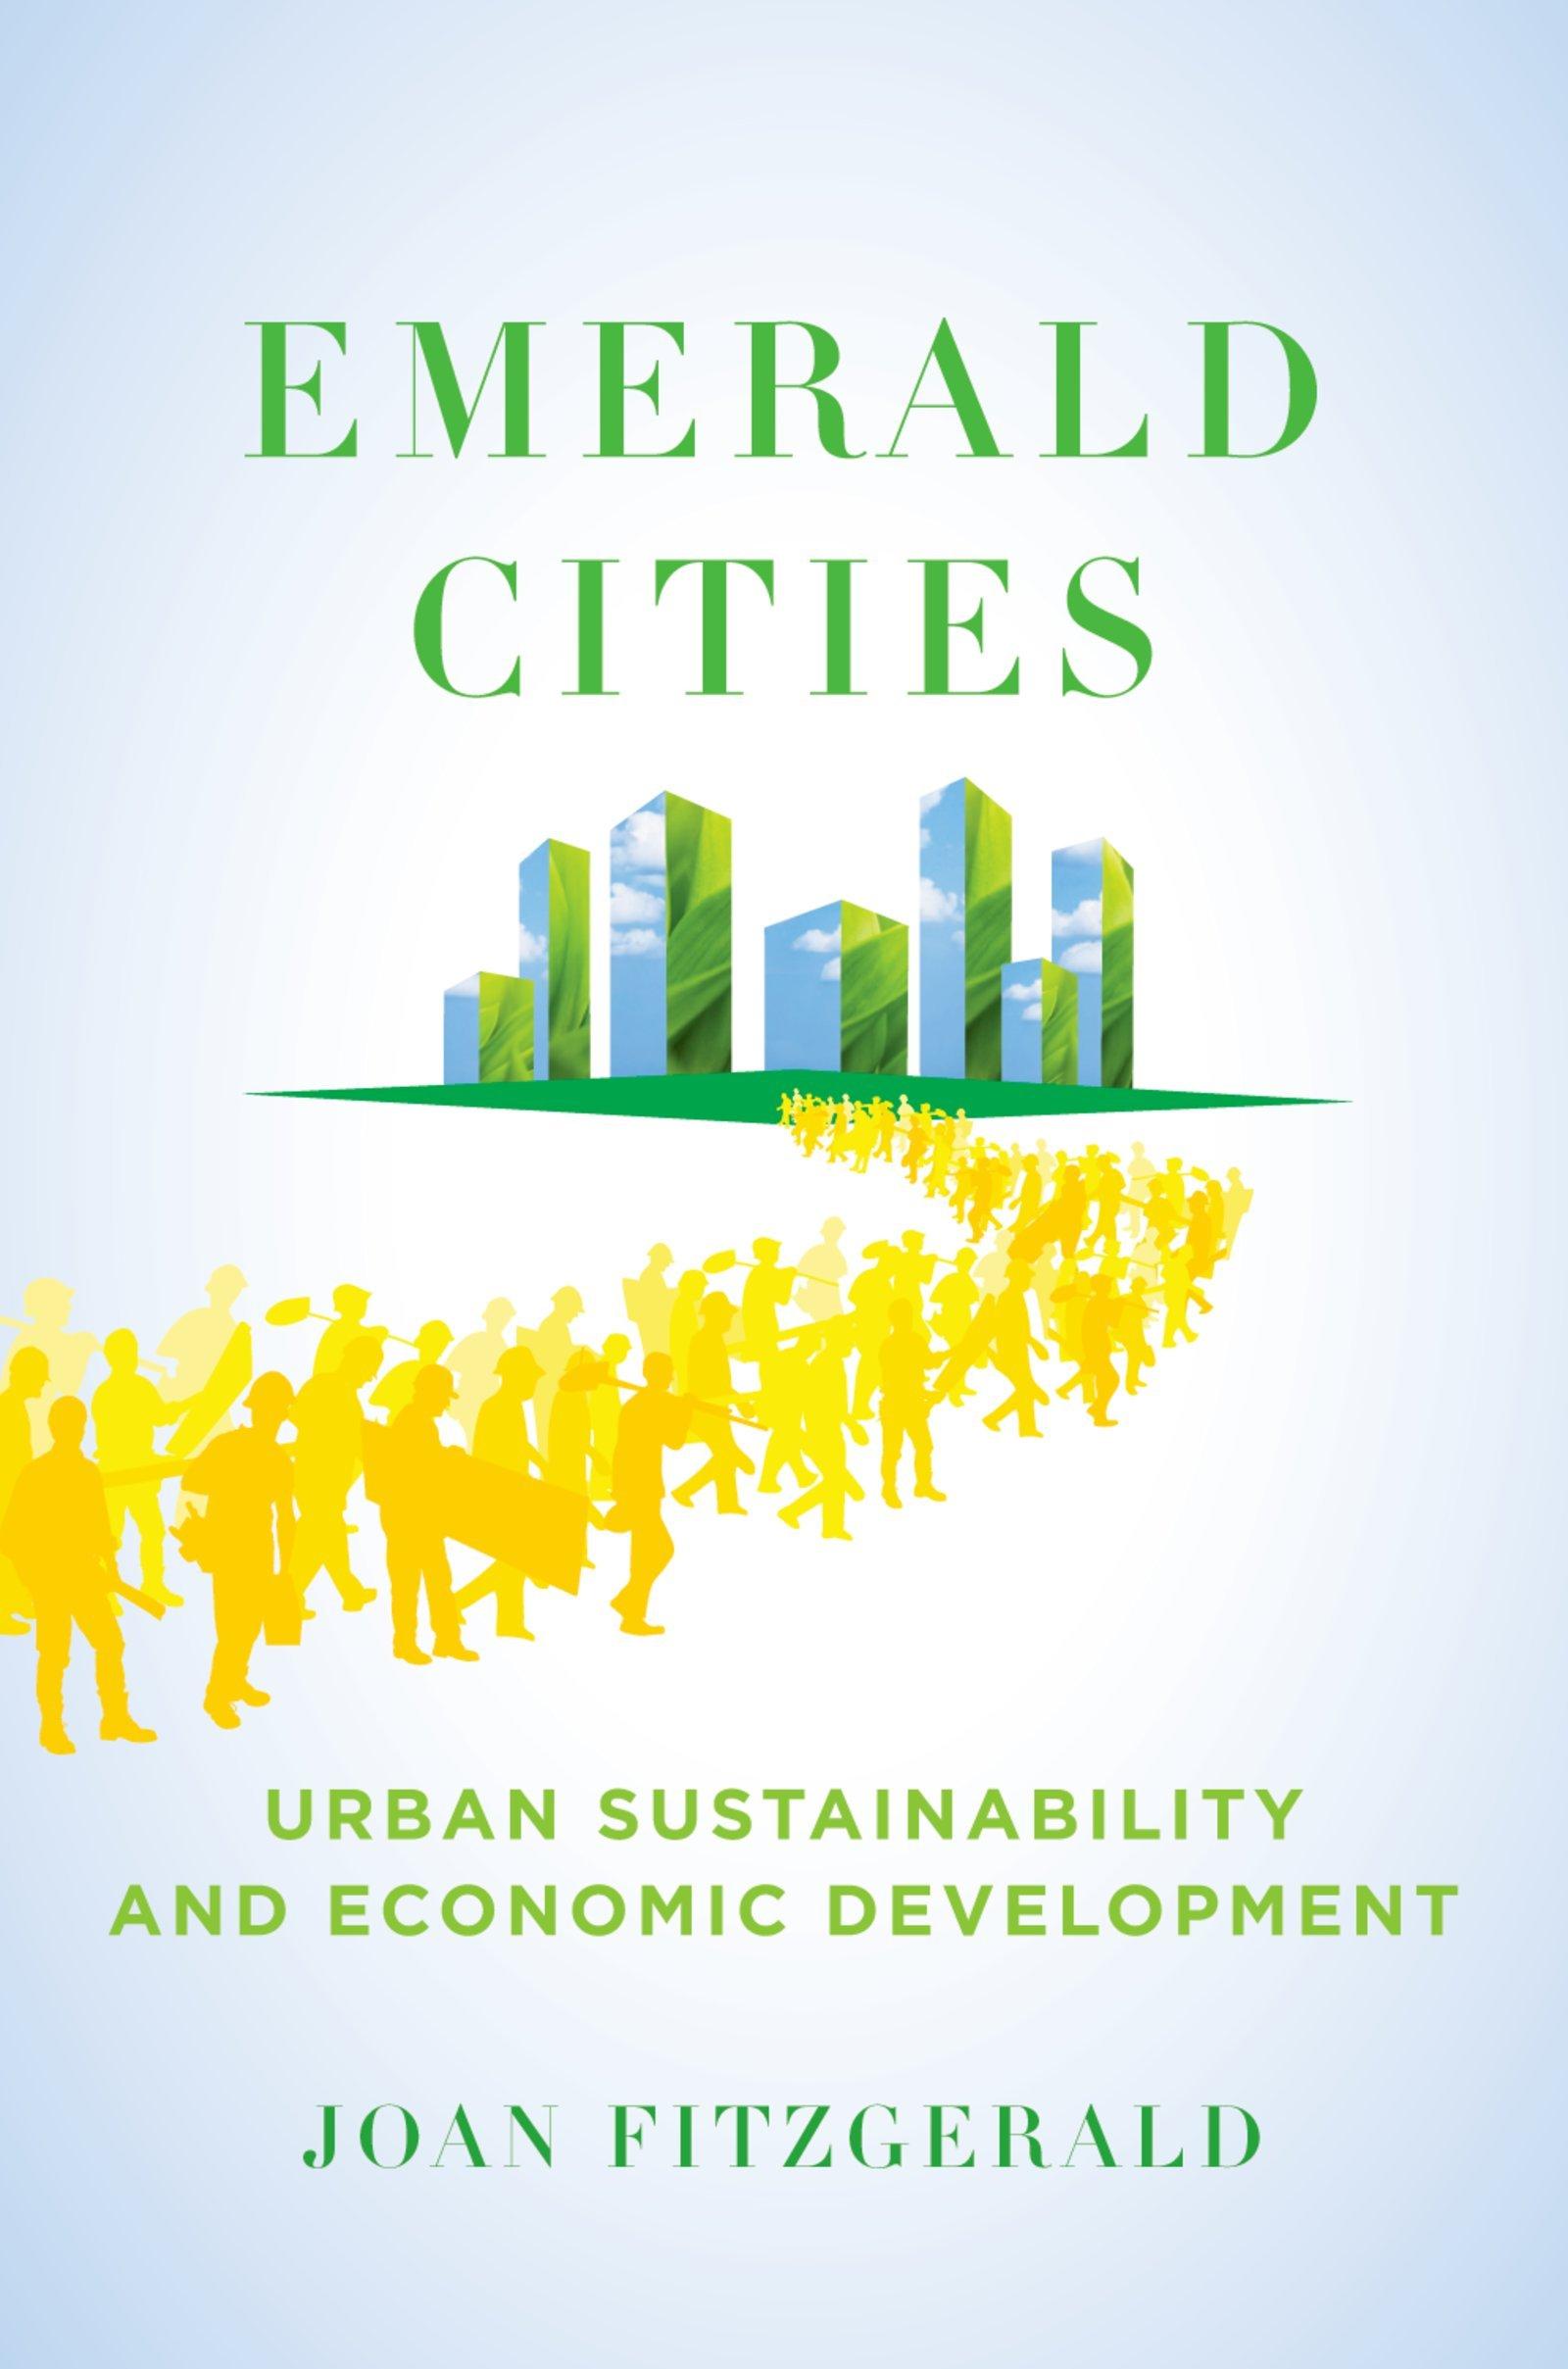 Emerald Cities: Urban Sustainability and Economic Development